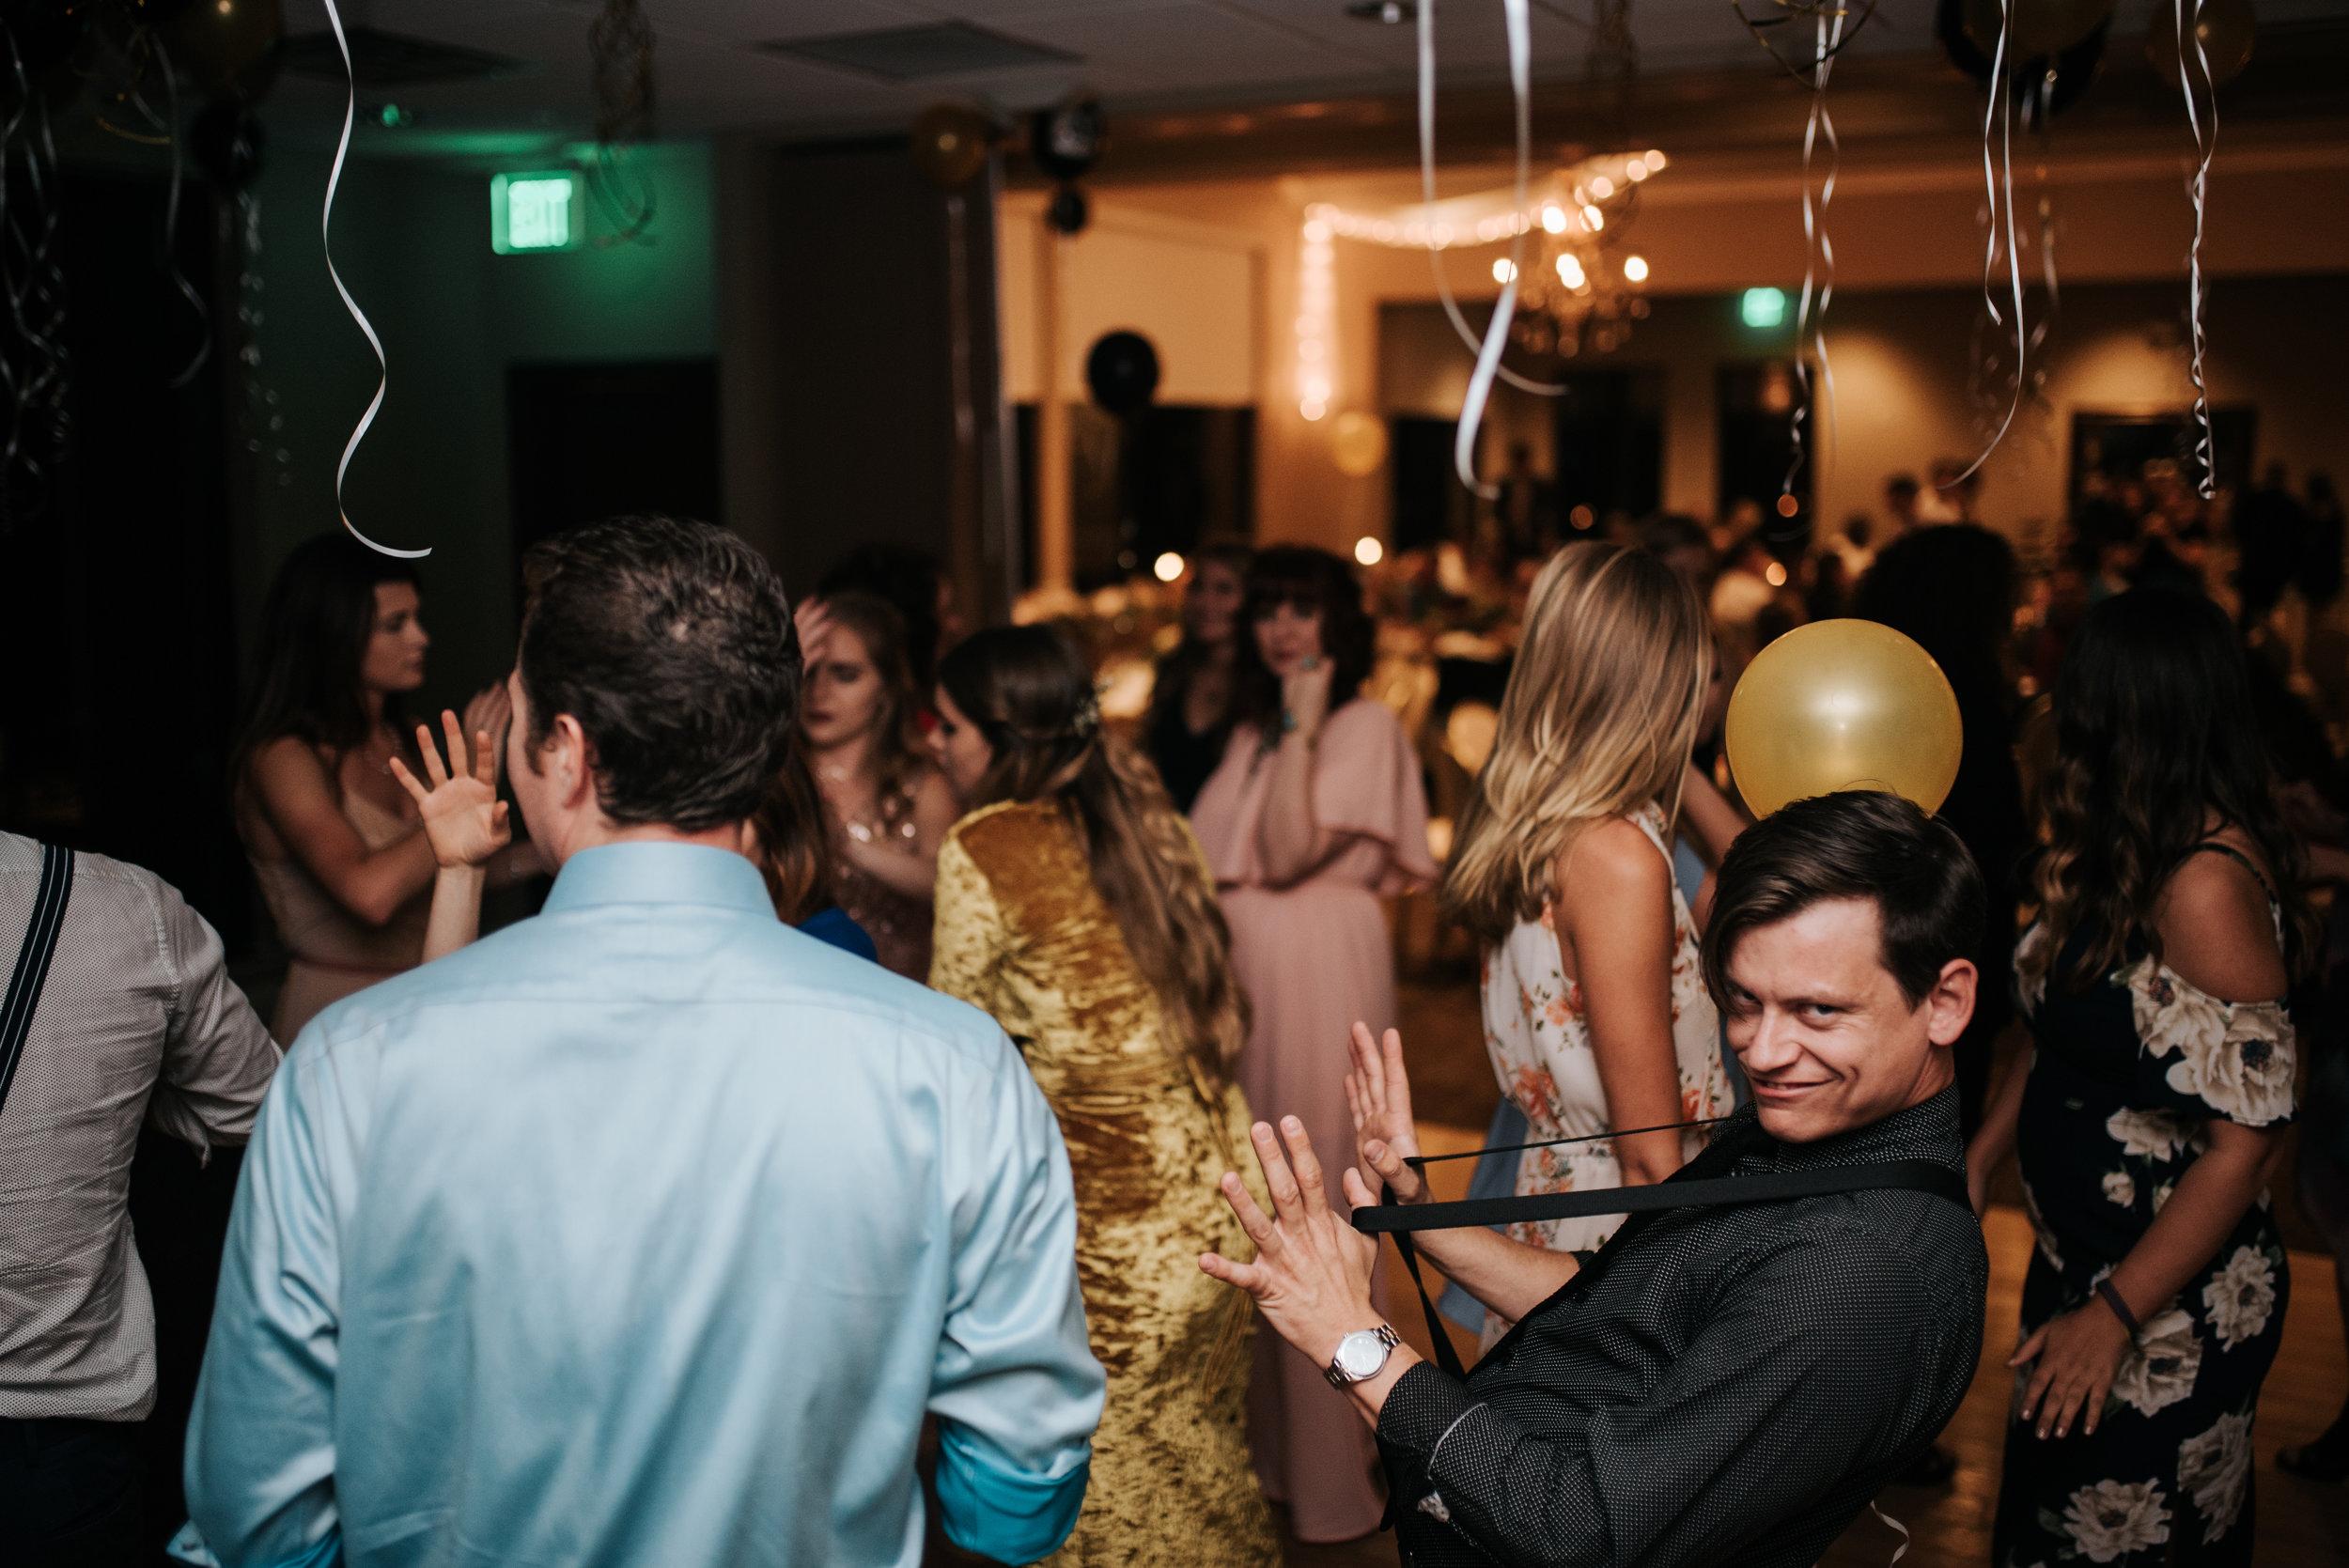 zayda-collin-panama-city-wedding-photography-trippy-bohemian-lisa-frank-wedding-dancing-party-52.jpg